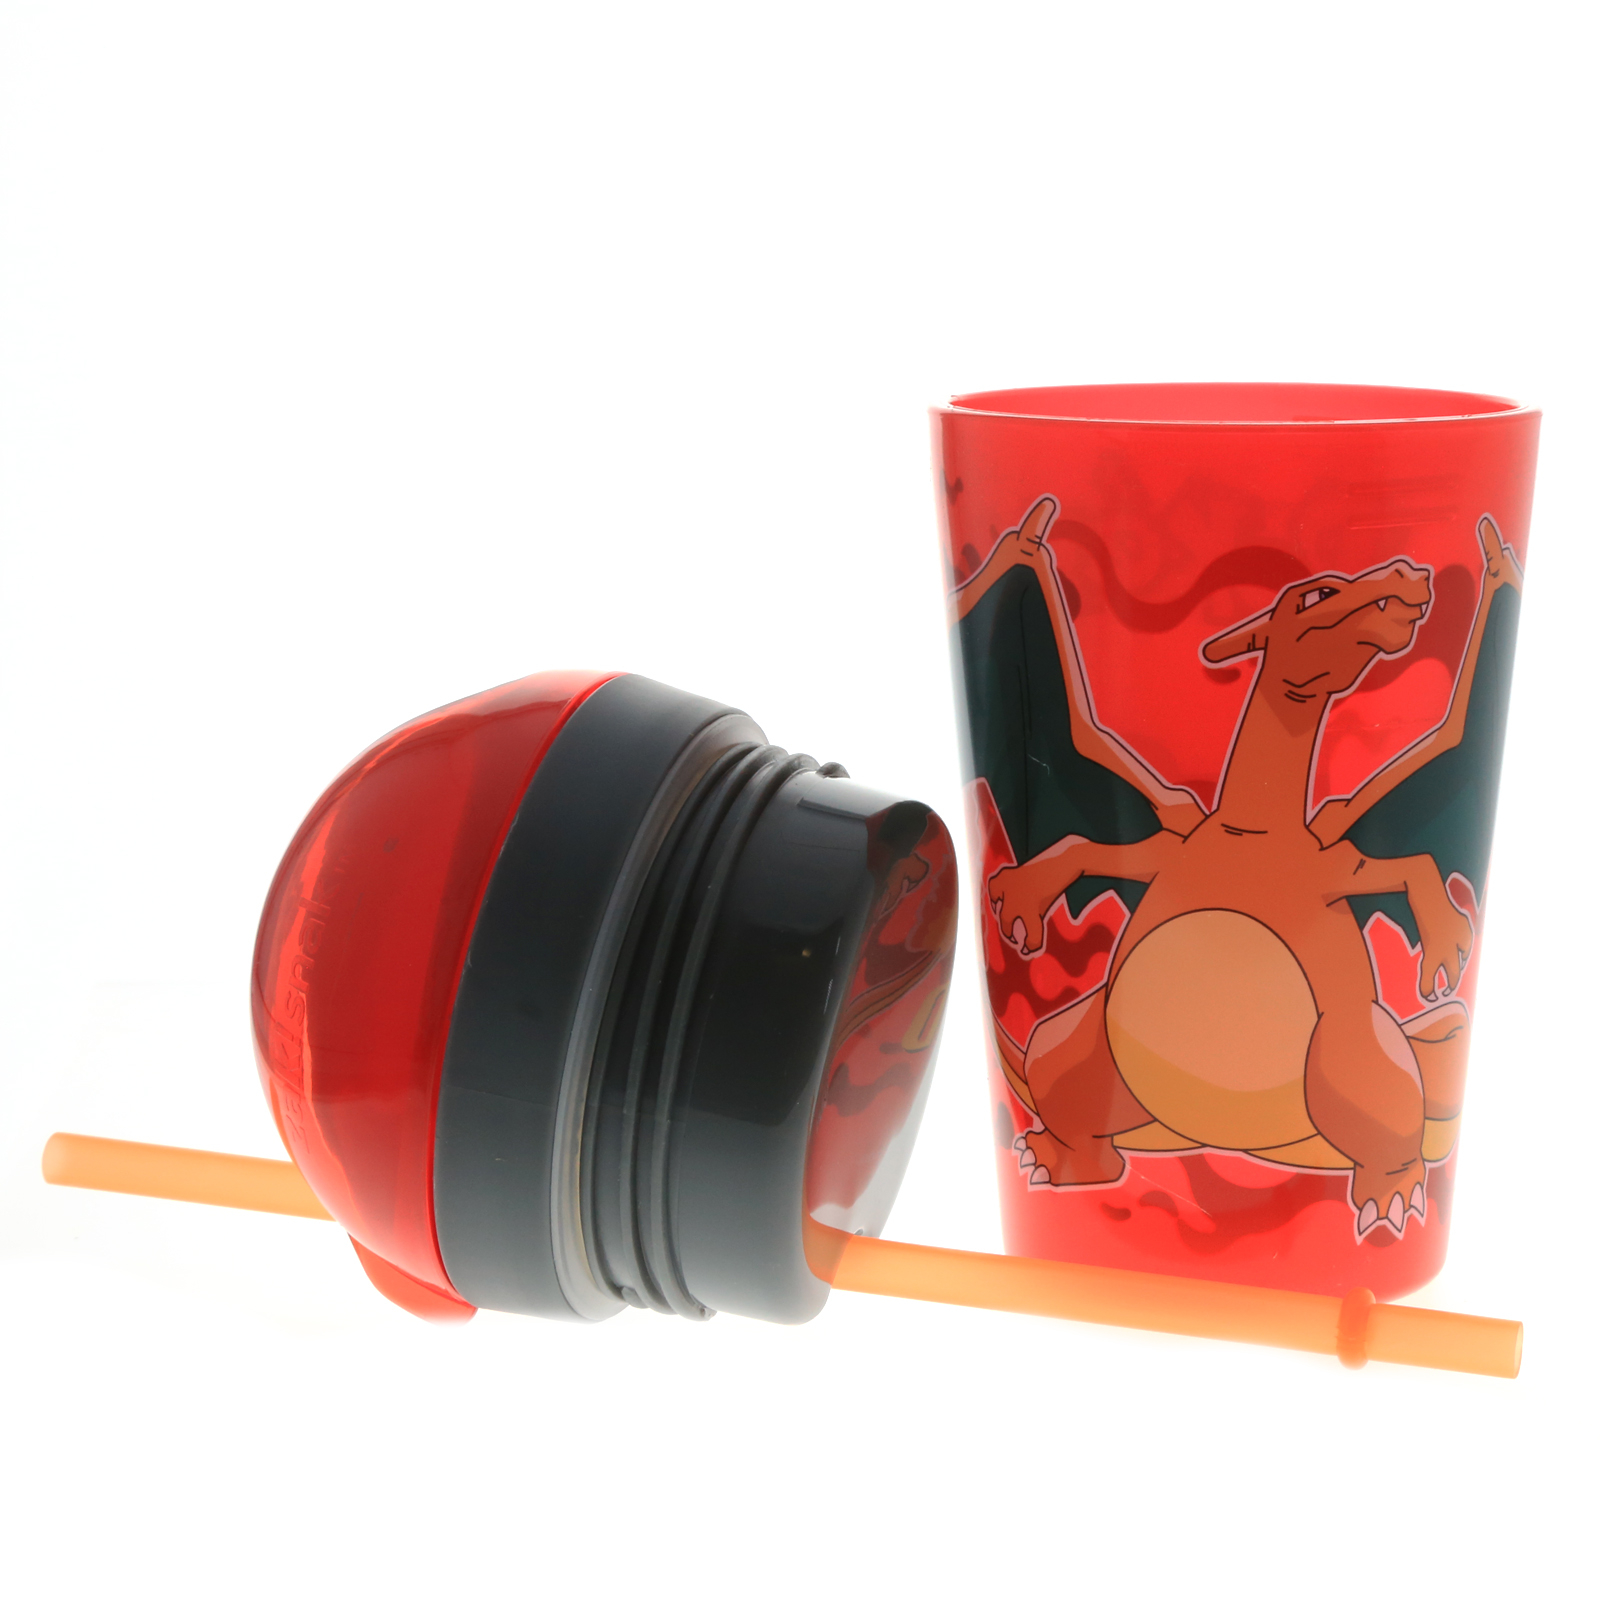 Pokemon Charizard Multi-Purpose Snack and Drink ZakSnak Tumbler BPA Free